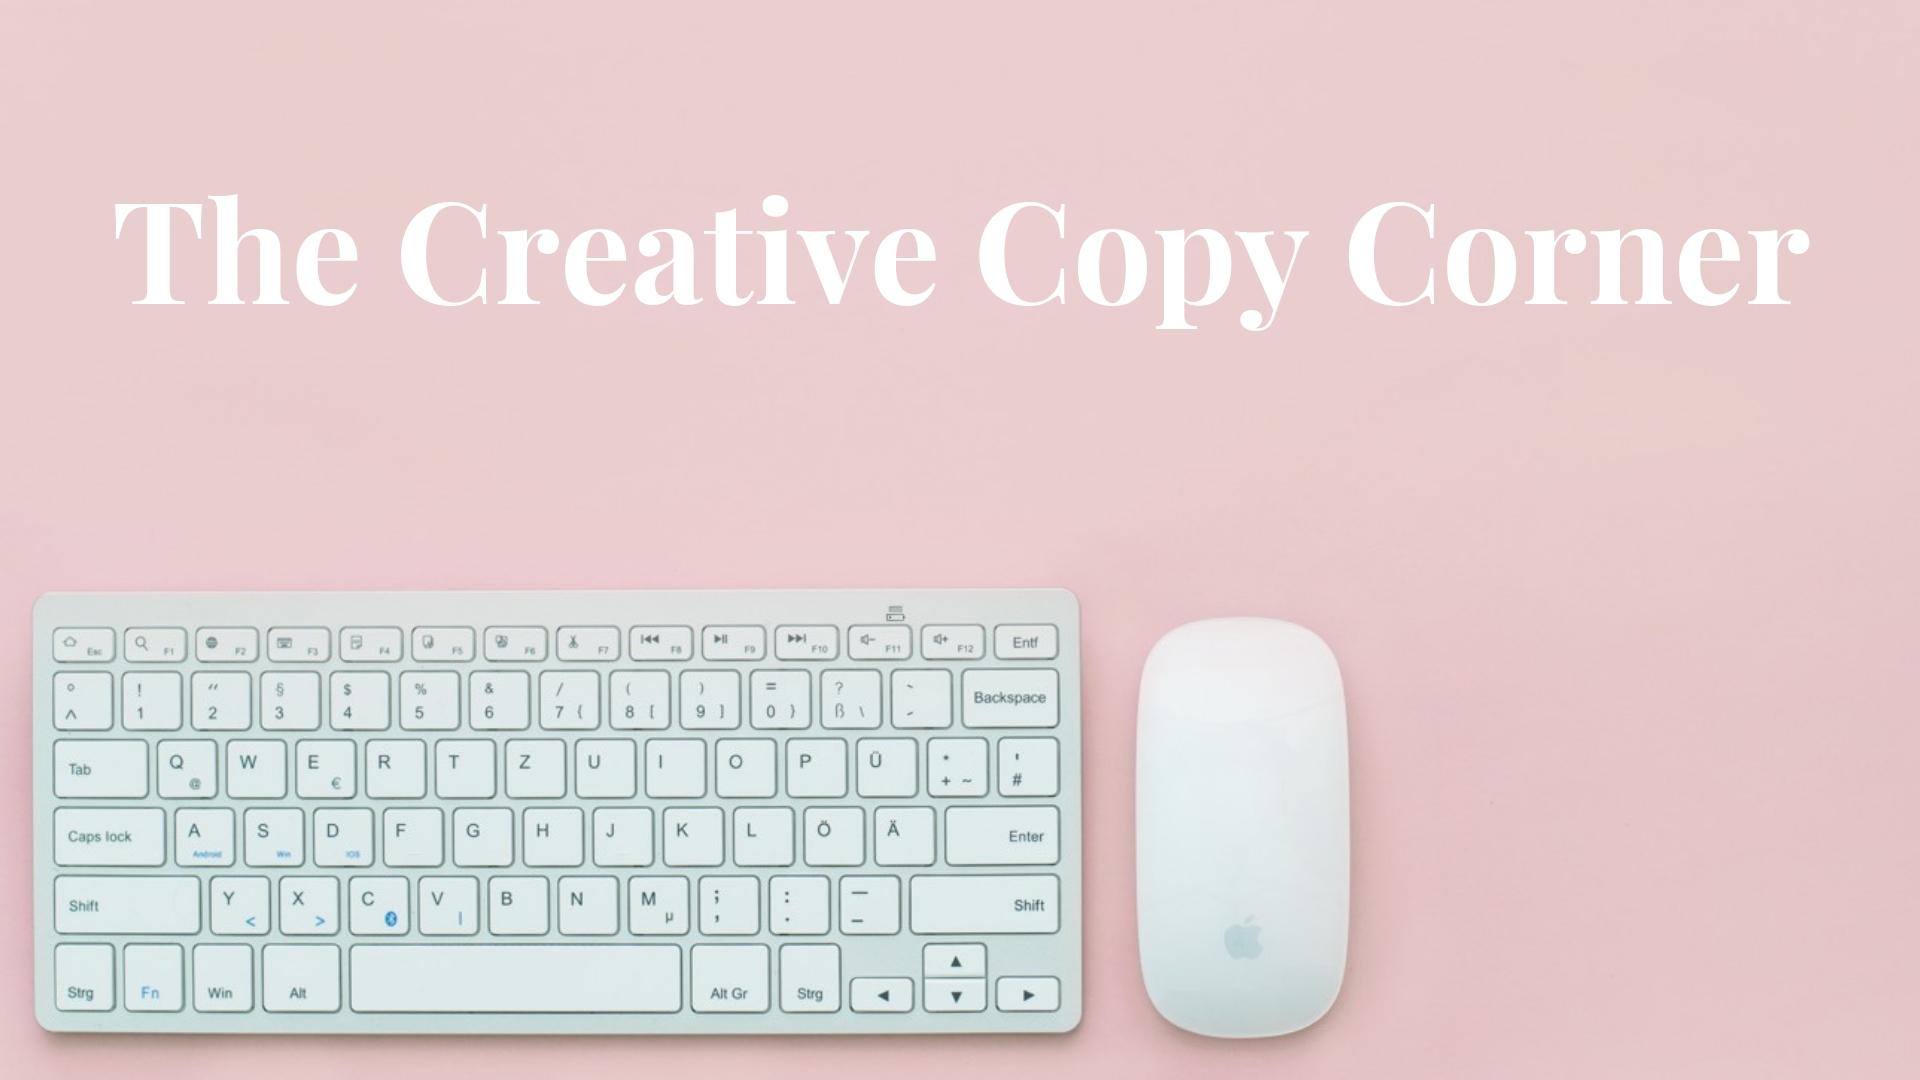 The Creative Copy Corner (1).jpg